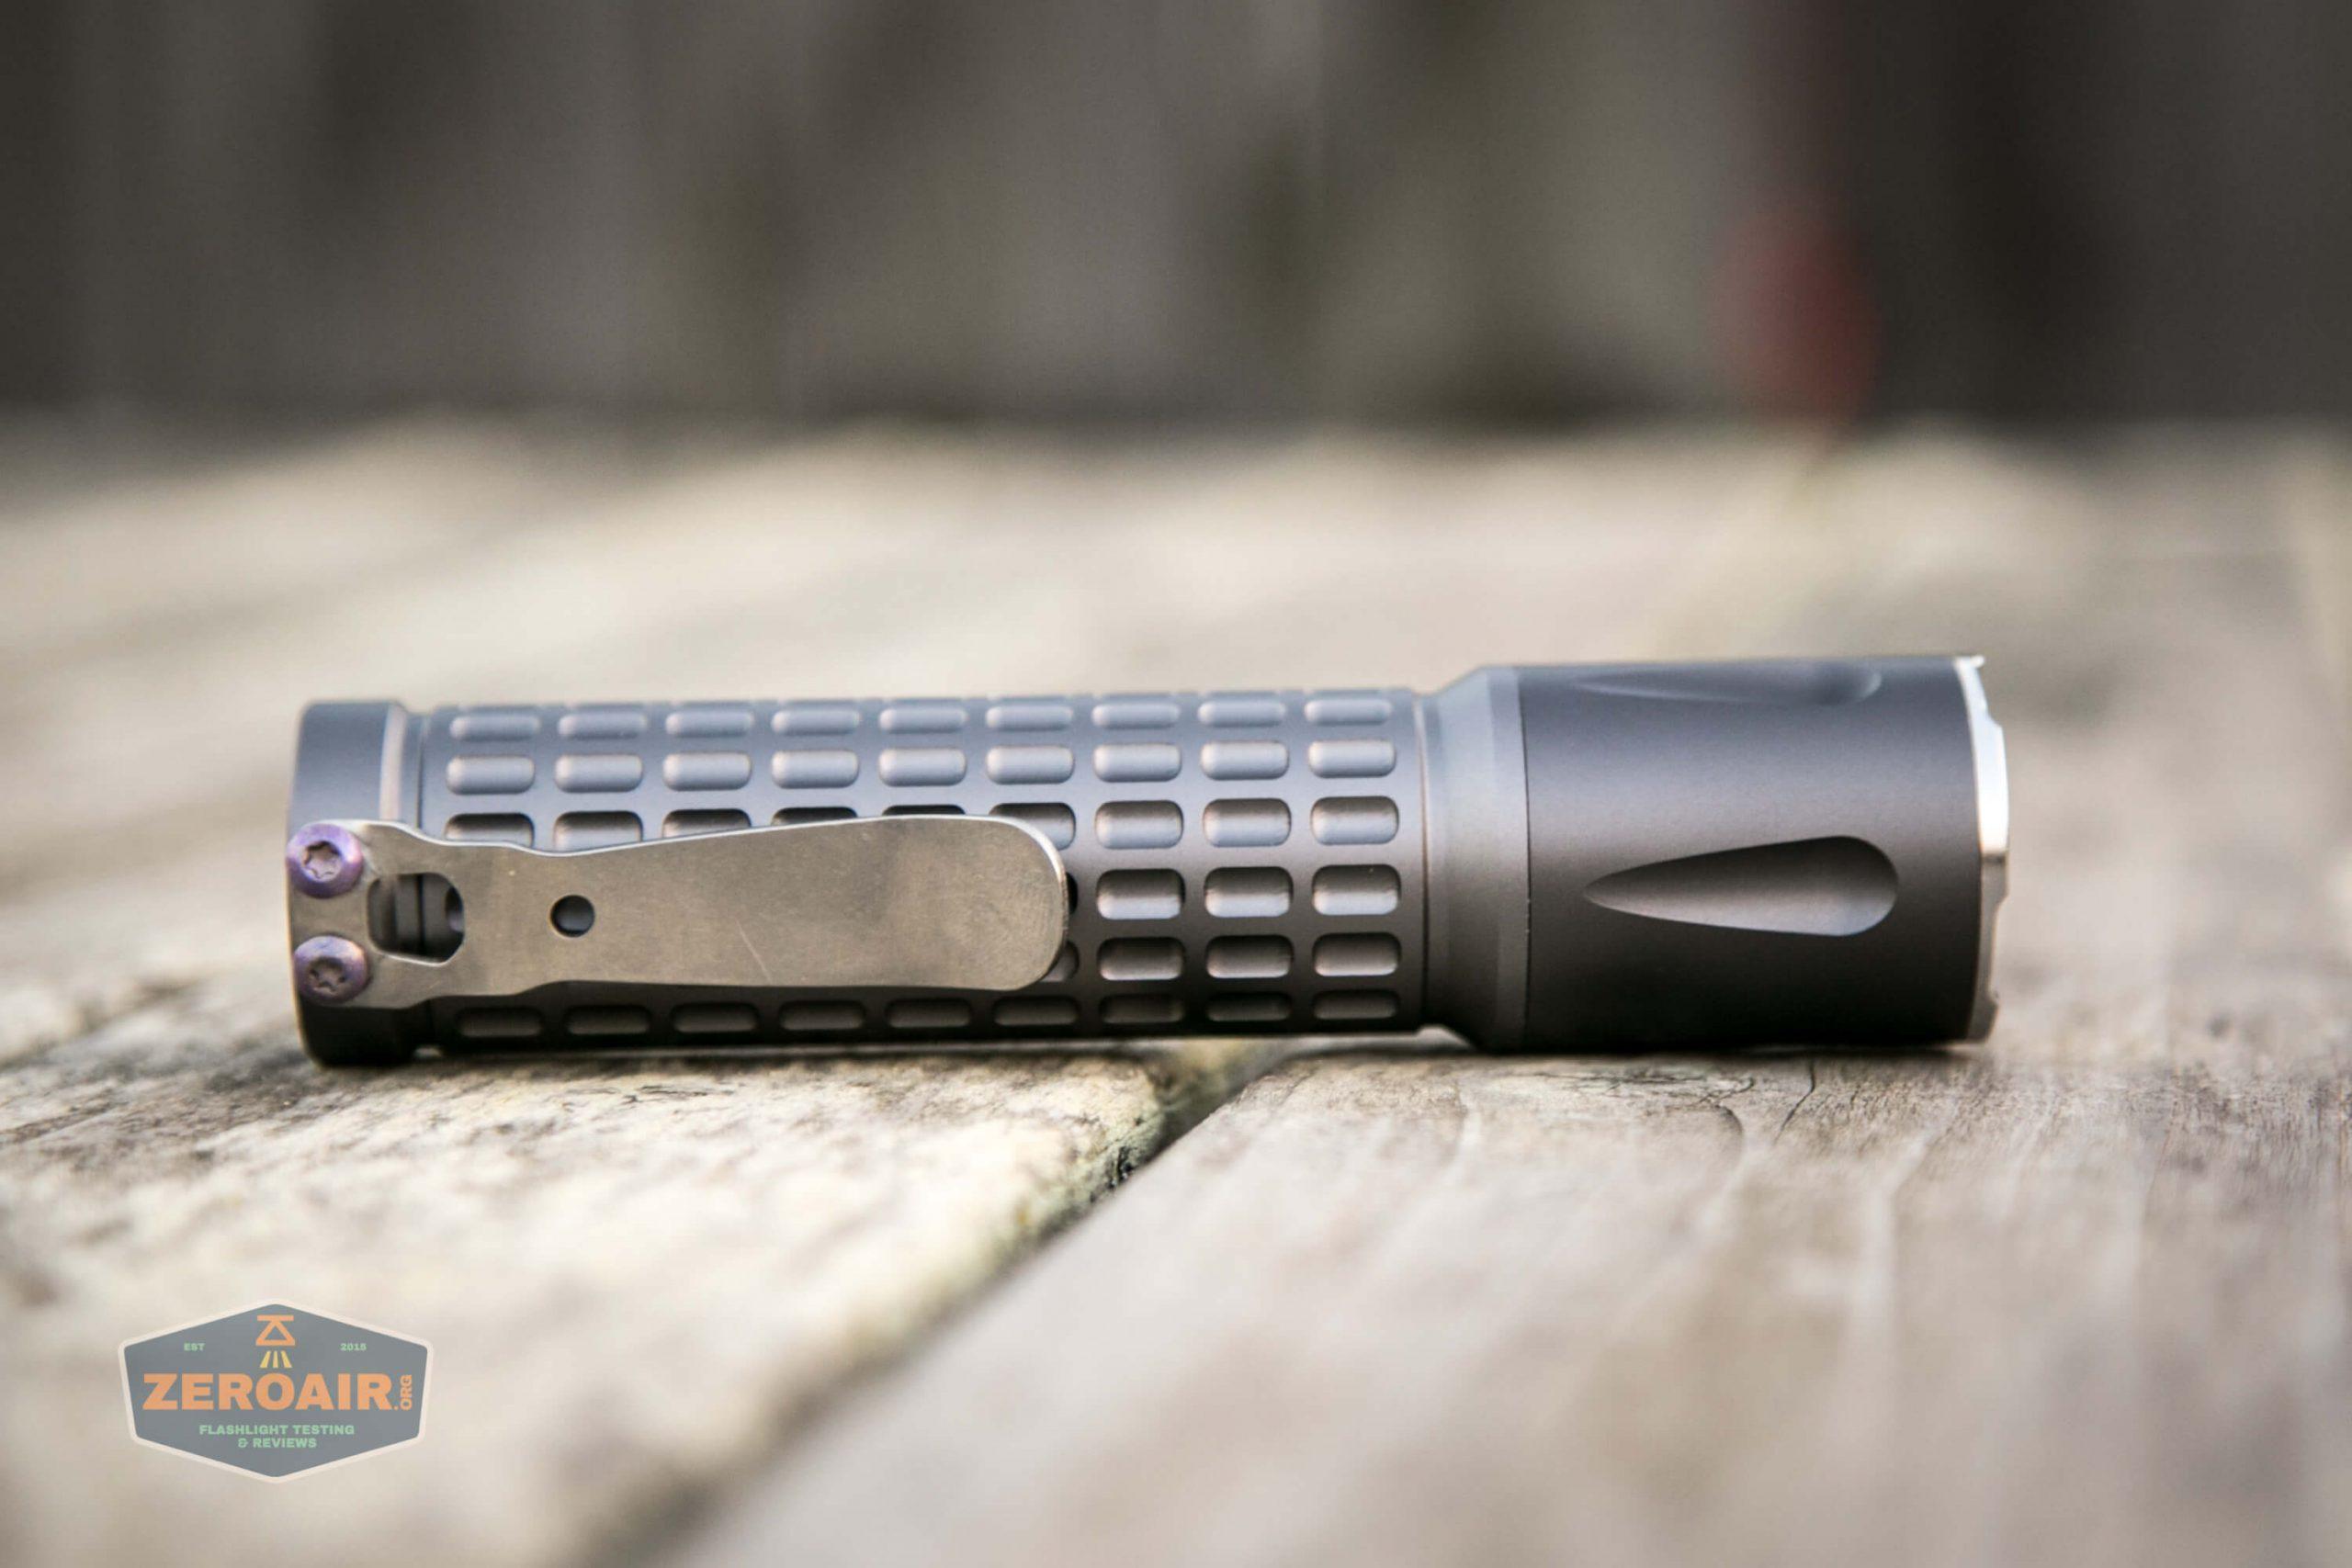 countycomm reylight 21700 quad emitter flashlight